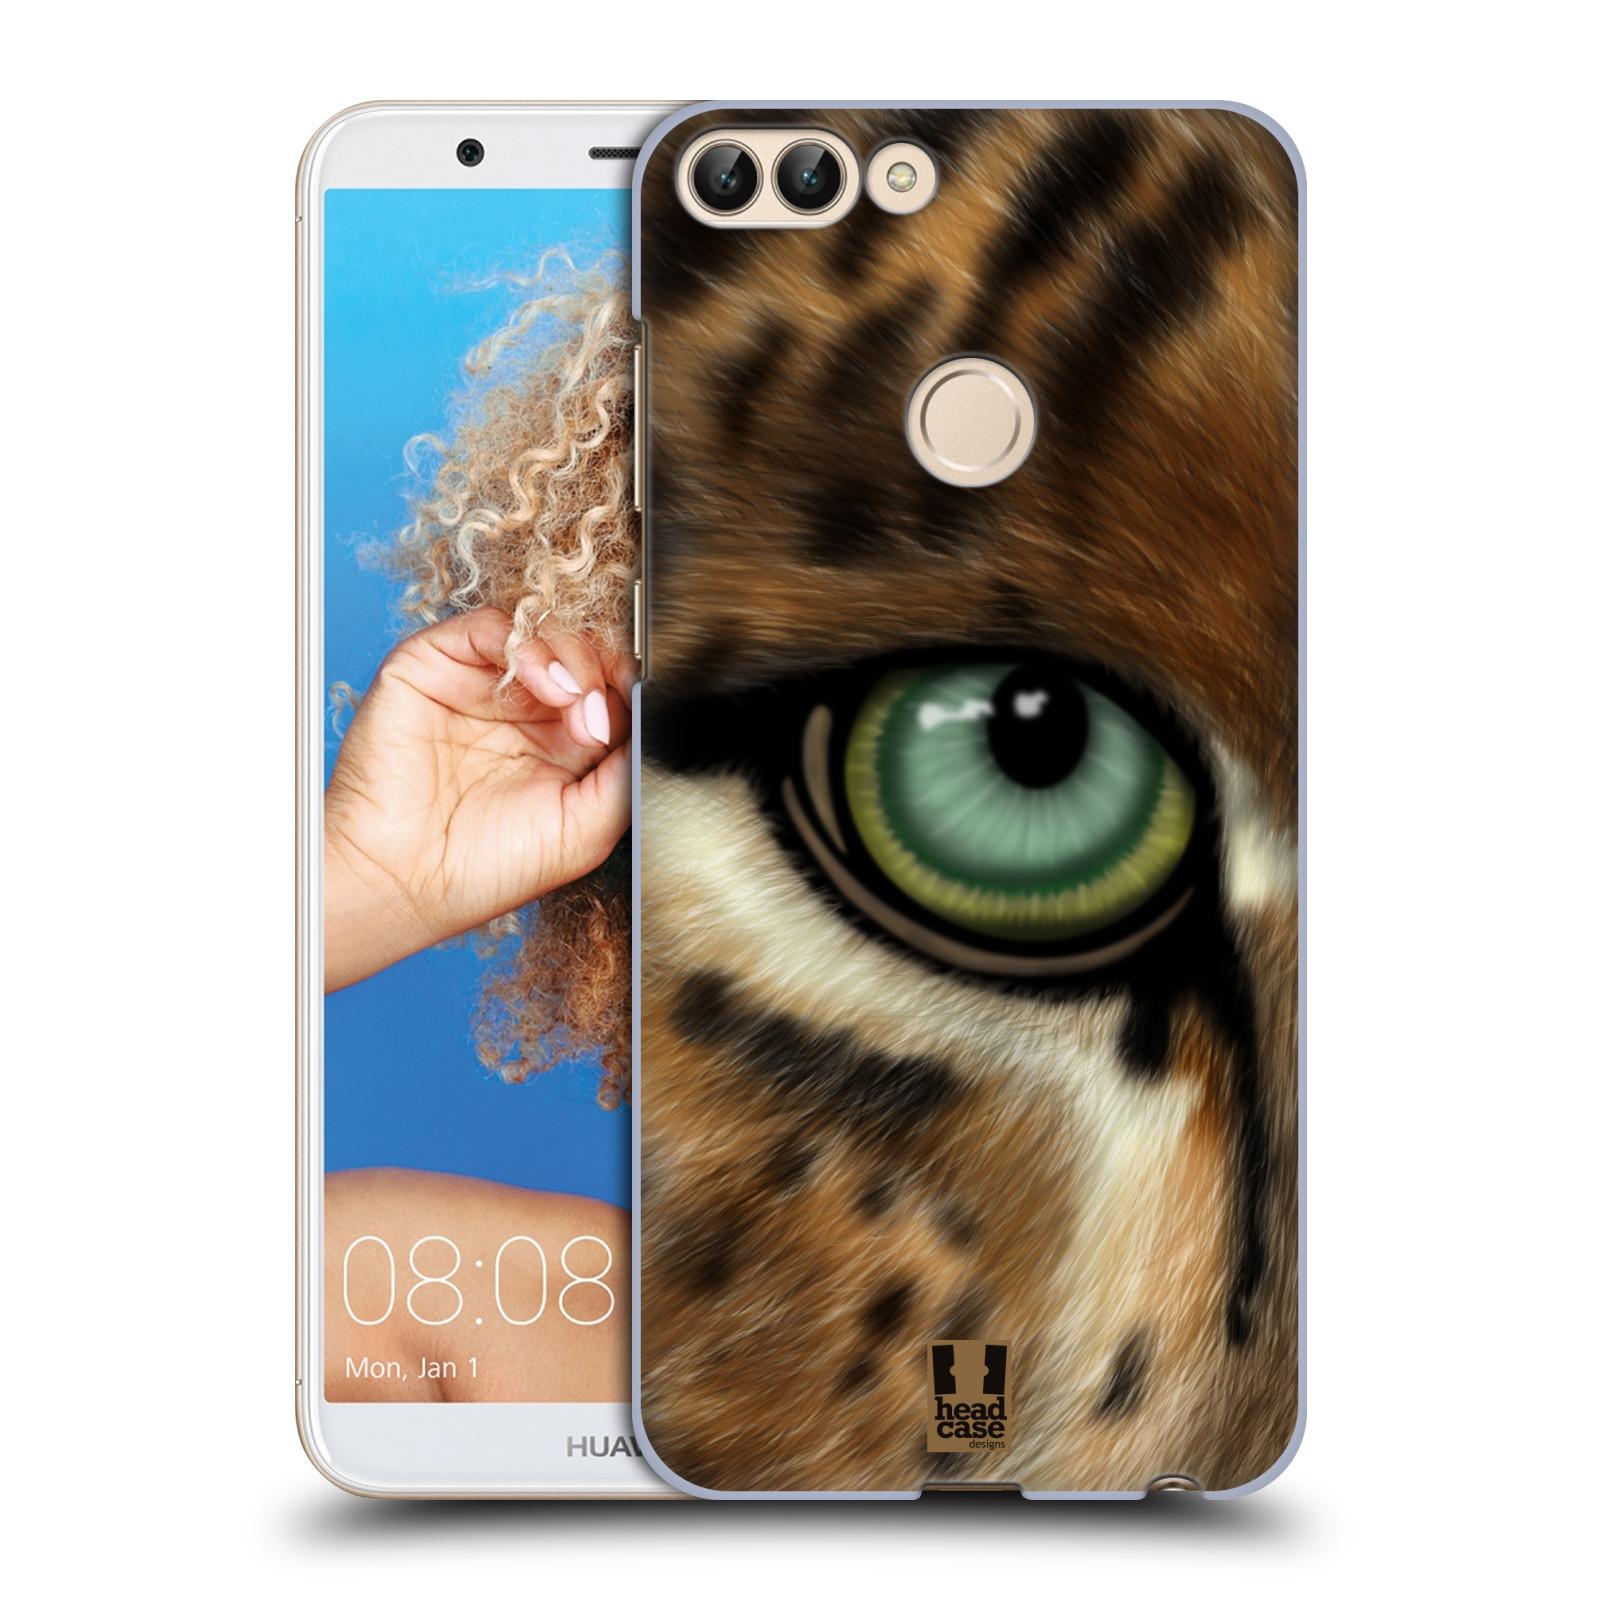 HEAD CASE plastový obal na mobil Huawei P Smart vzor pohled zvířete oko leopard